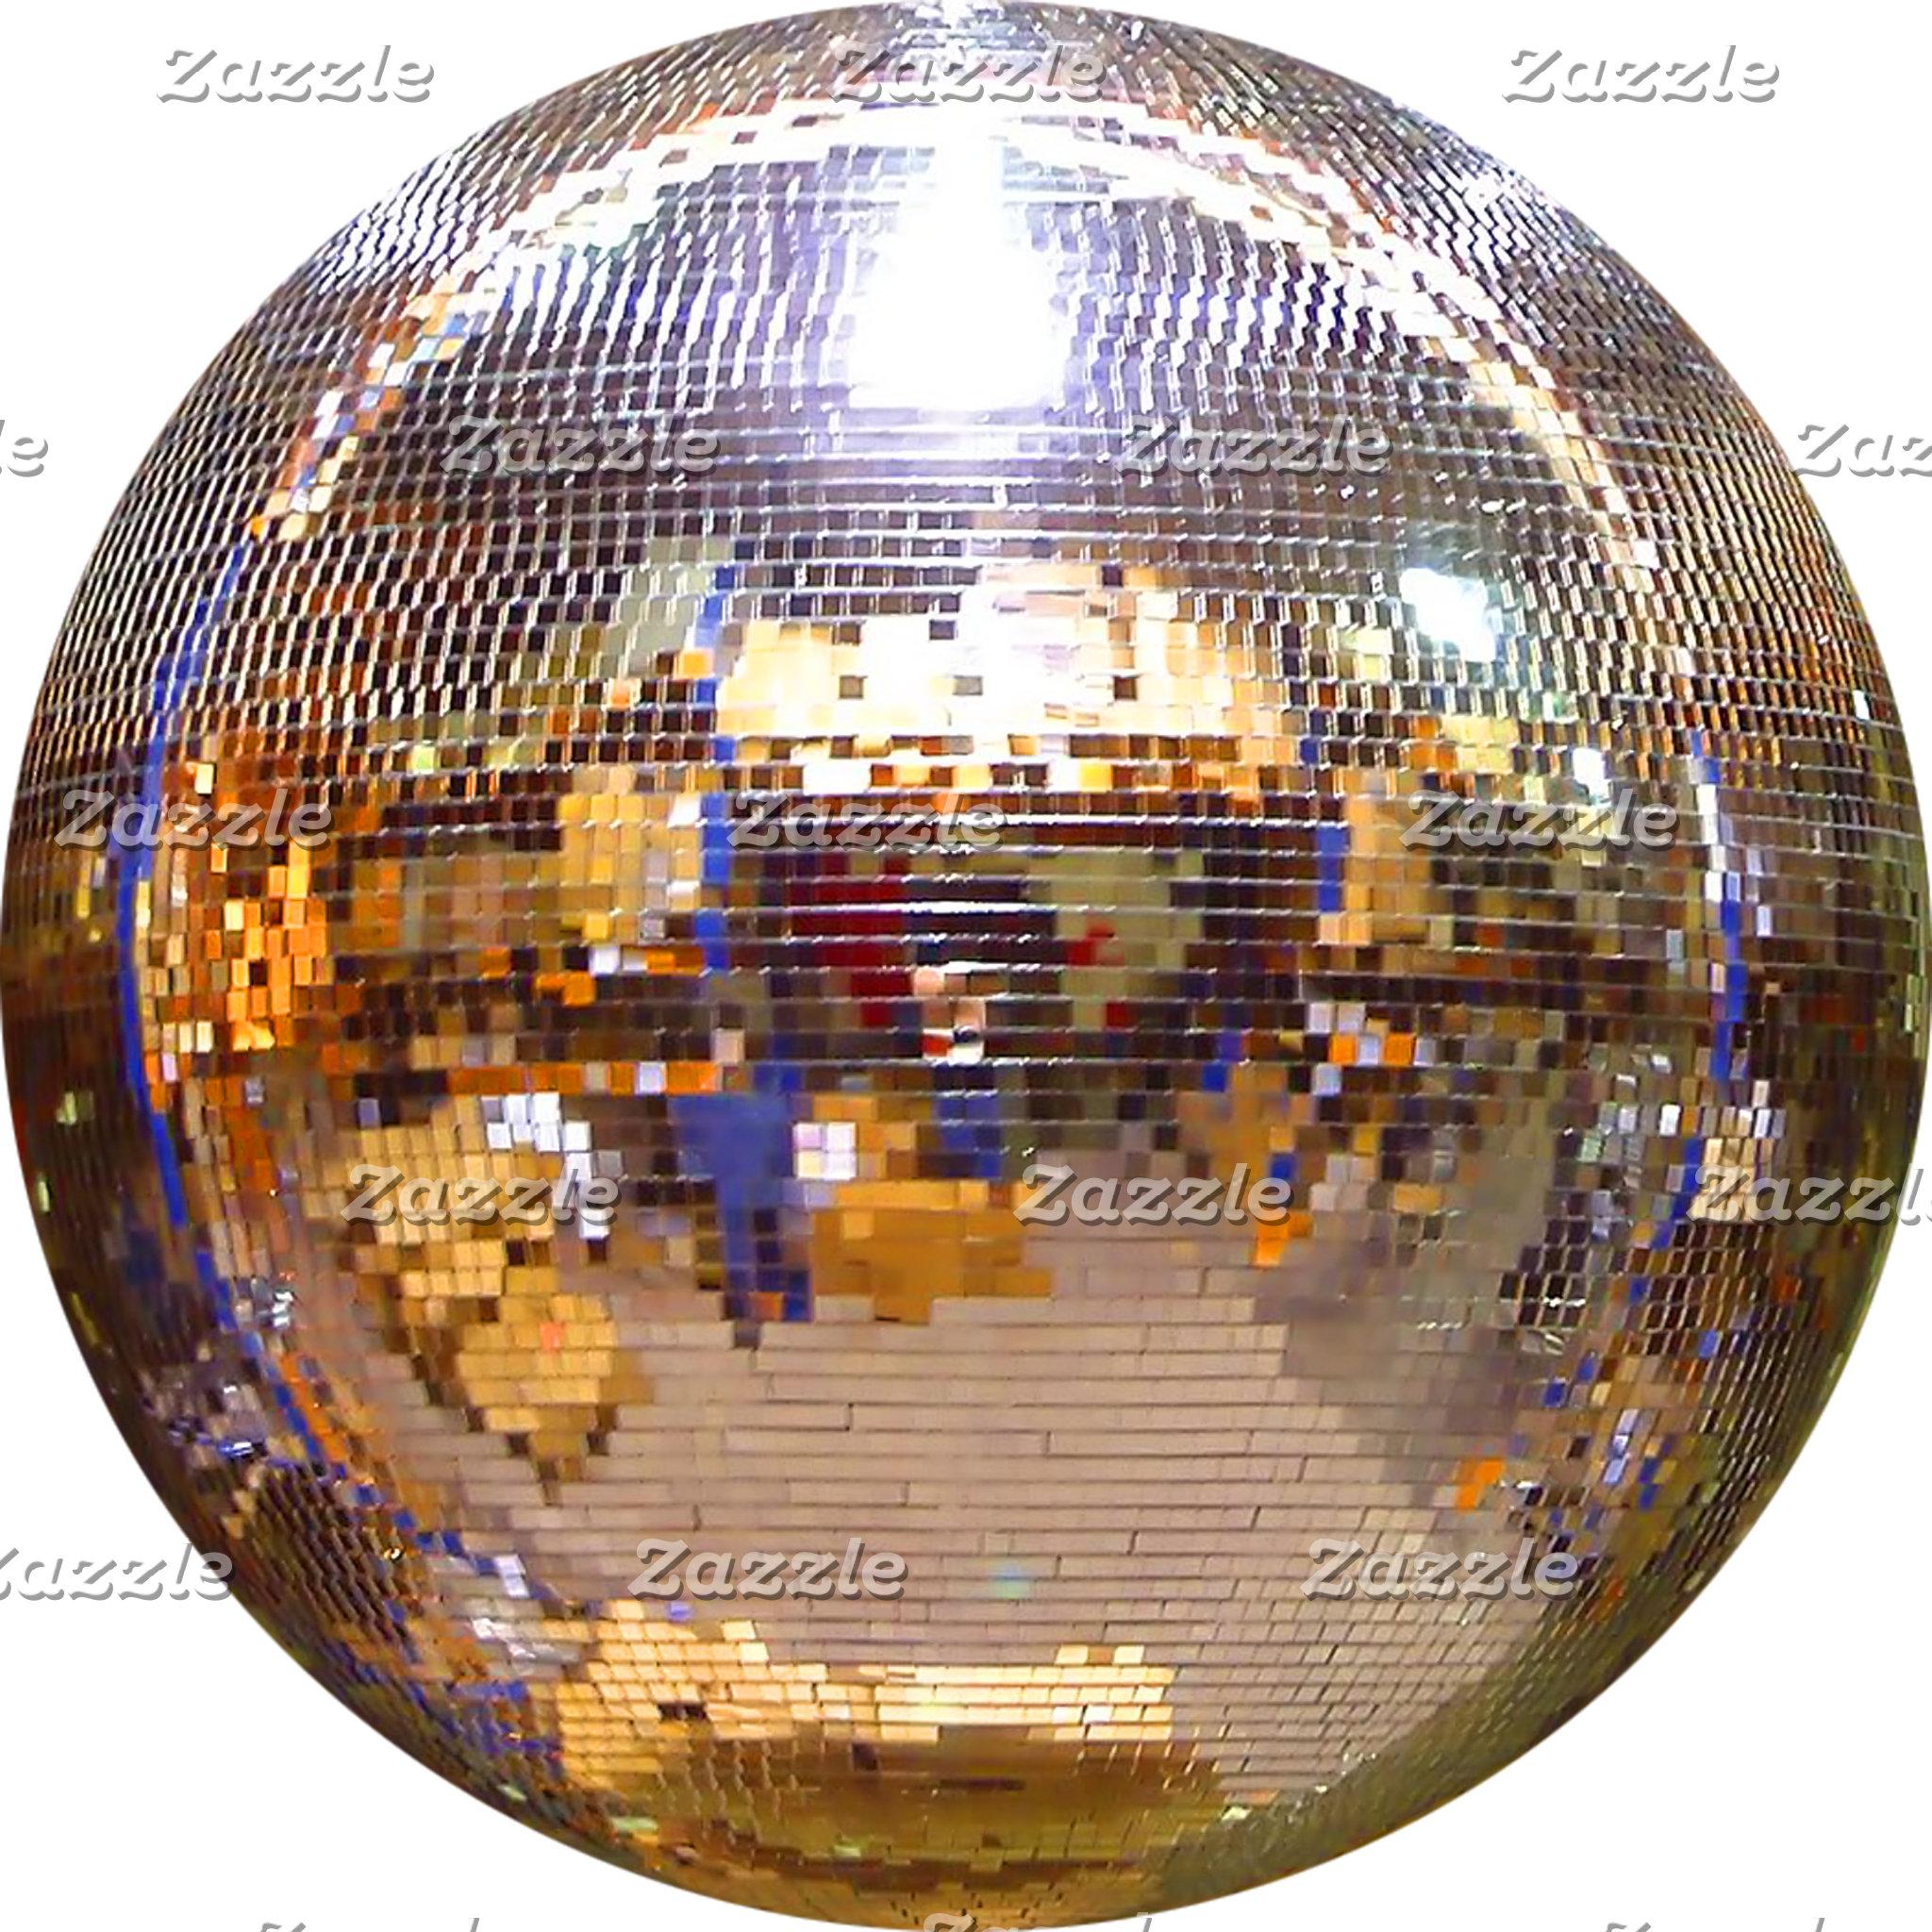 Mirrorball 2